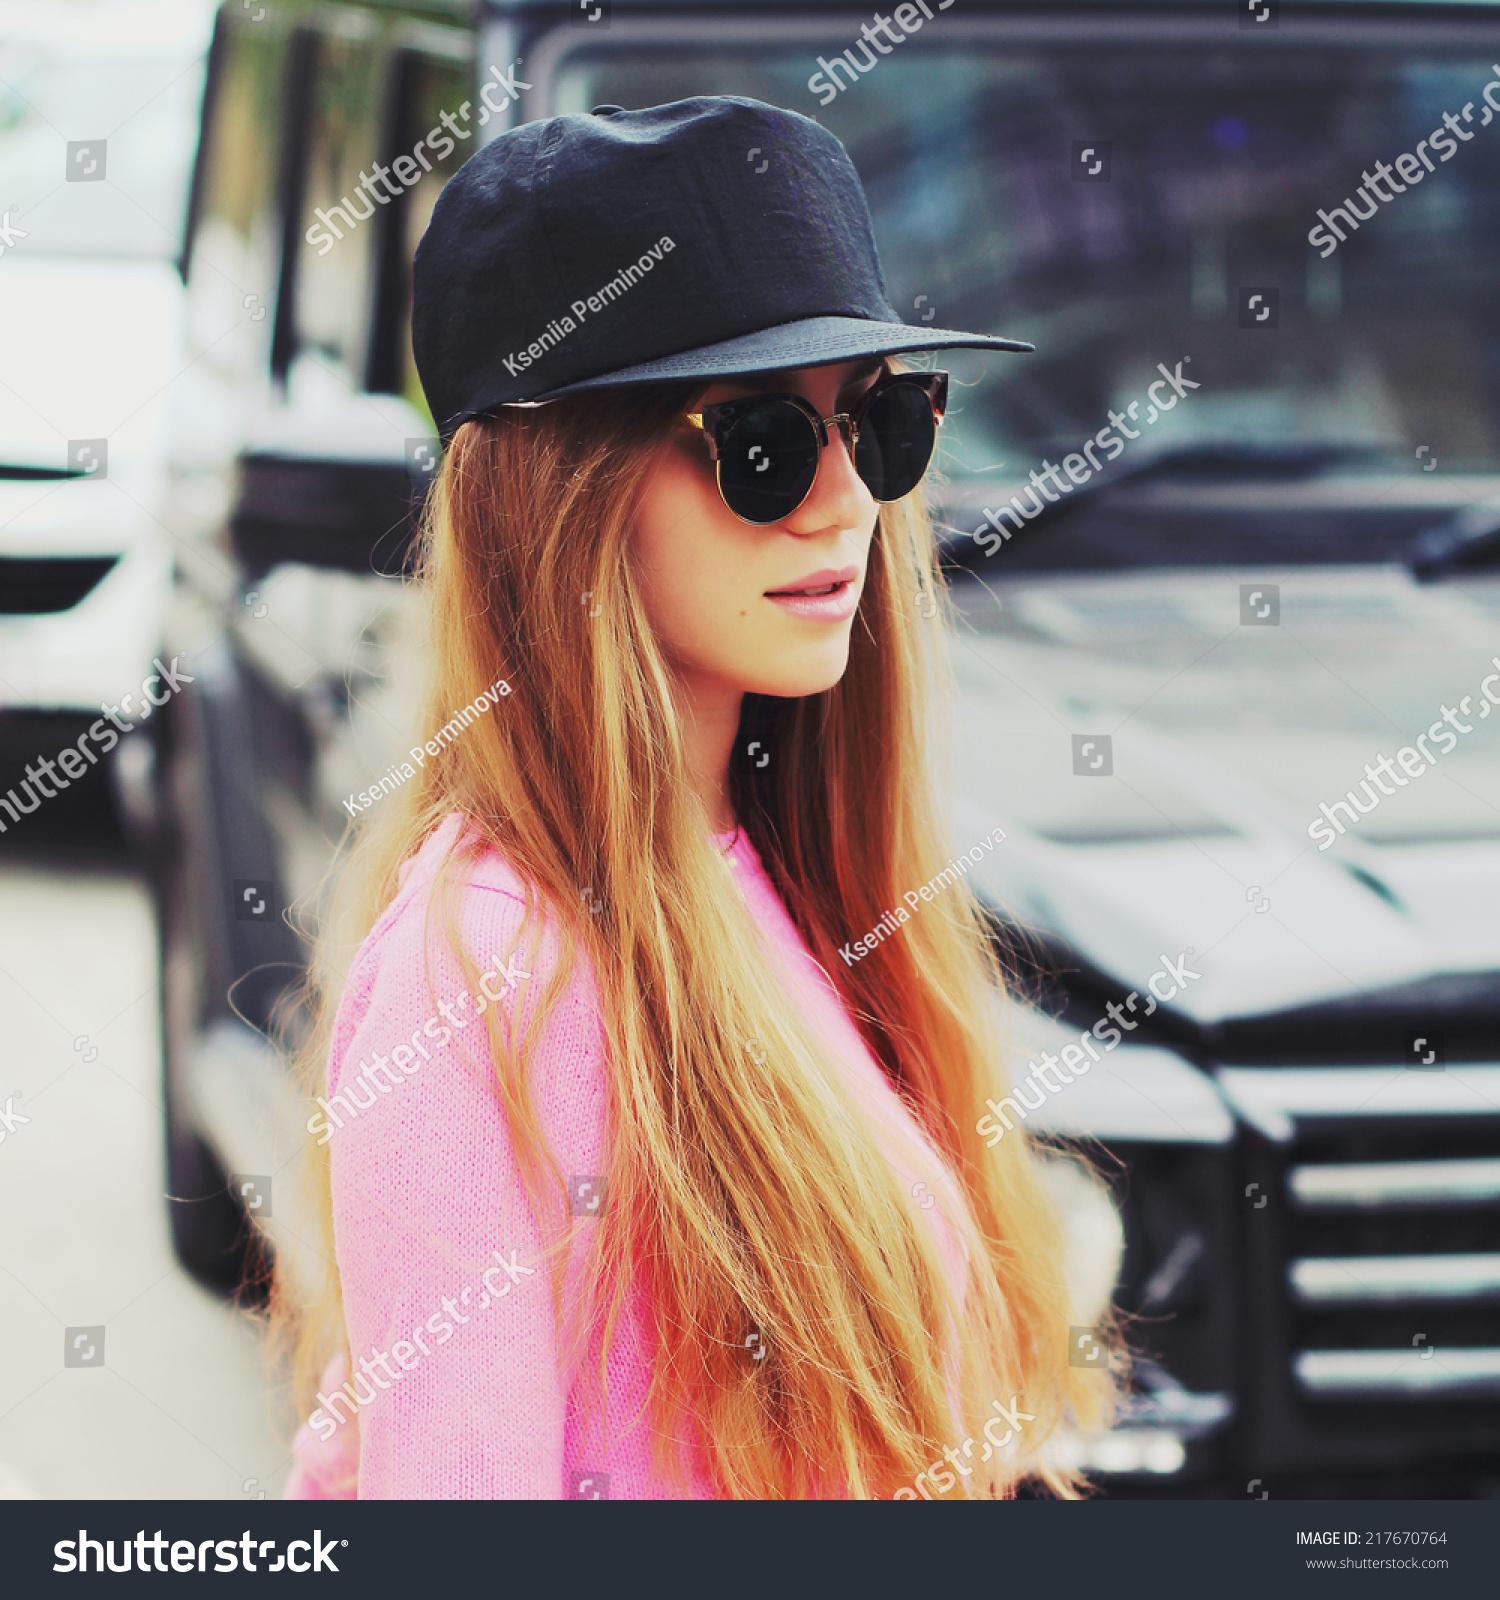 swag girl style instagram